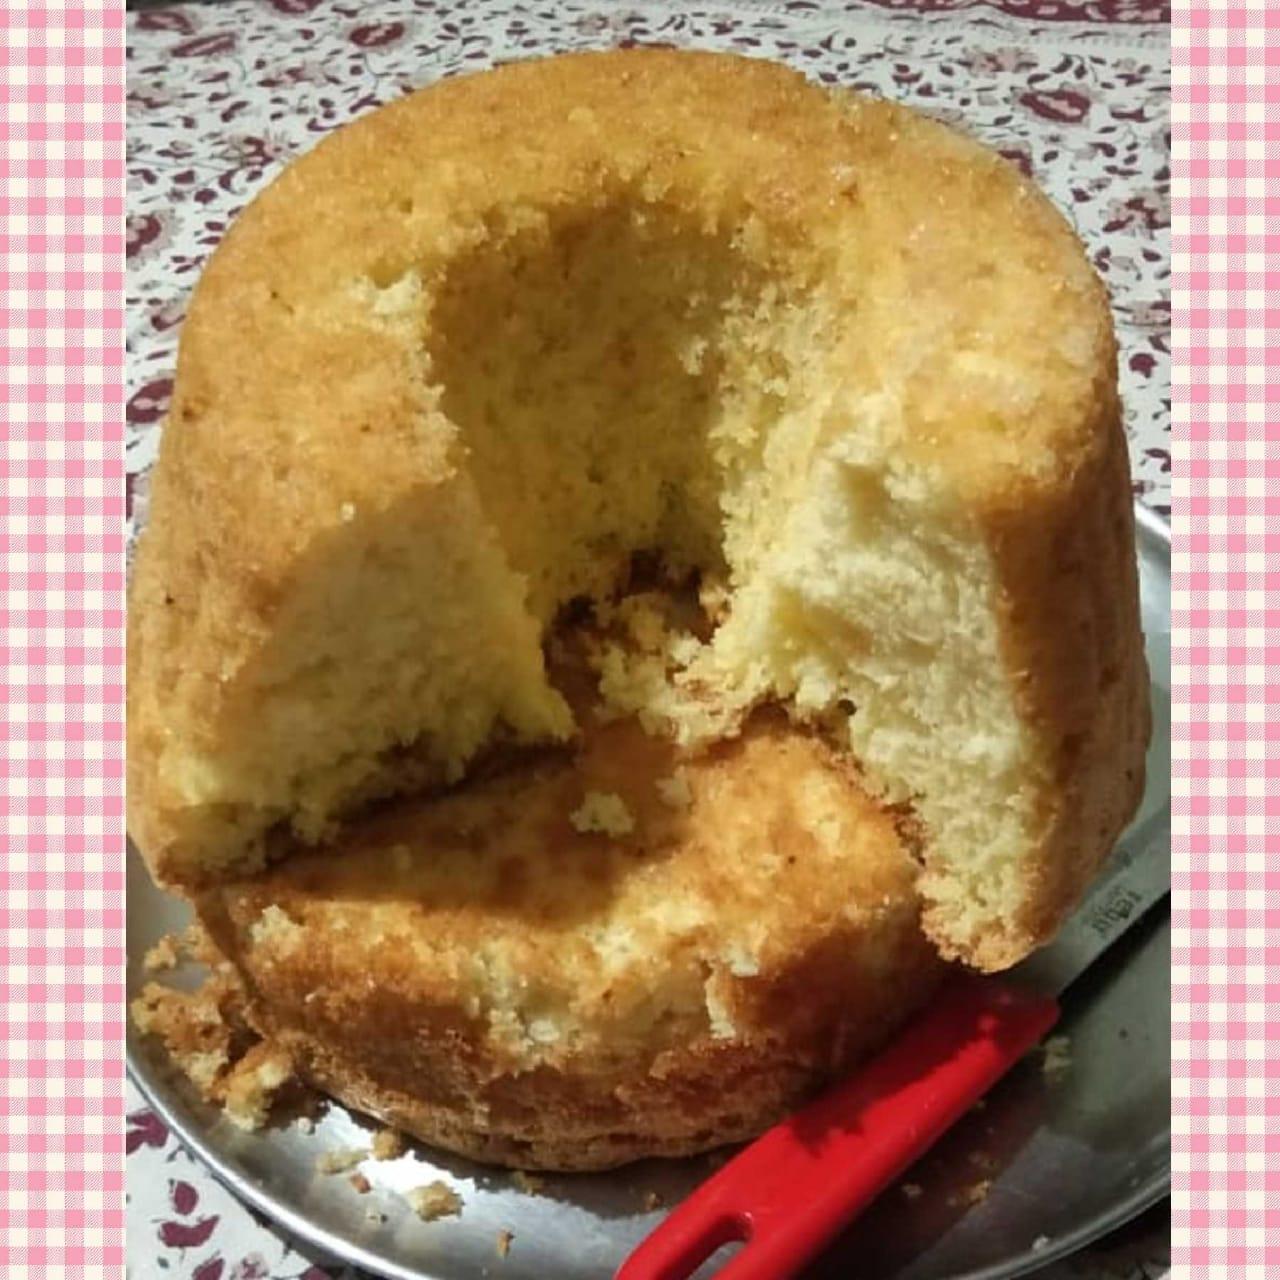 Egg-Yolk Sponge Cake Sulata Coelho